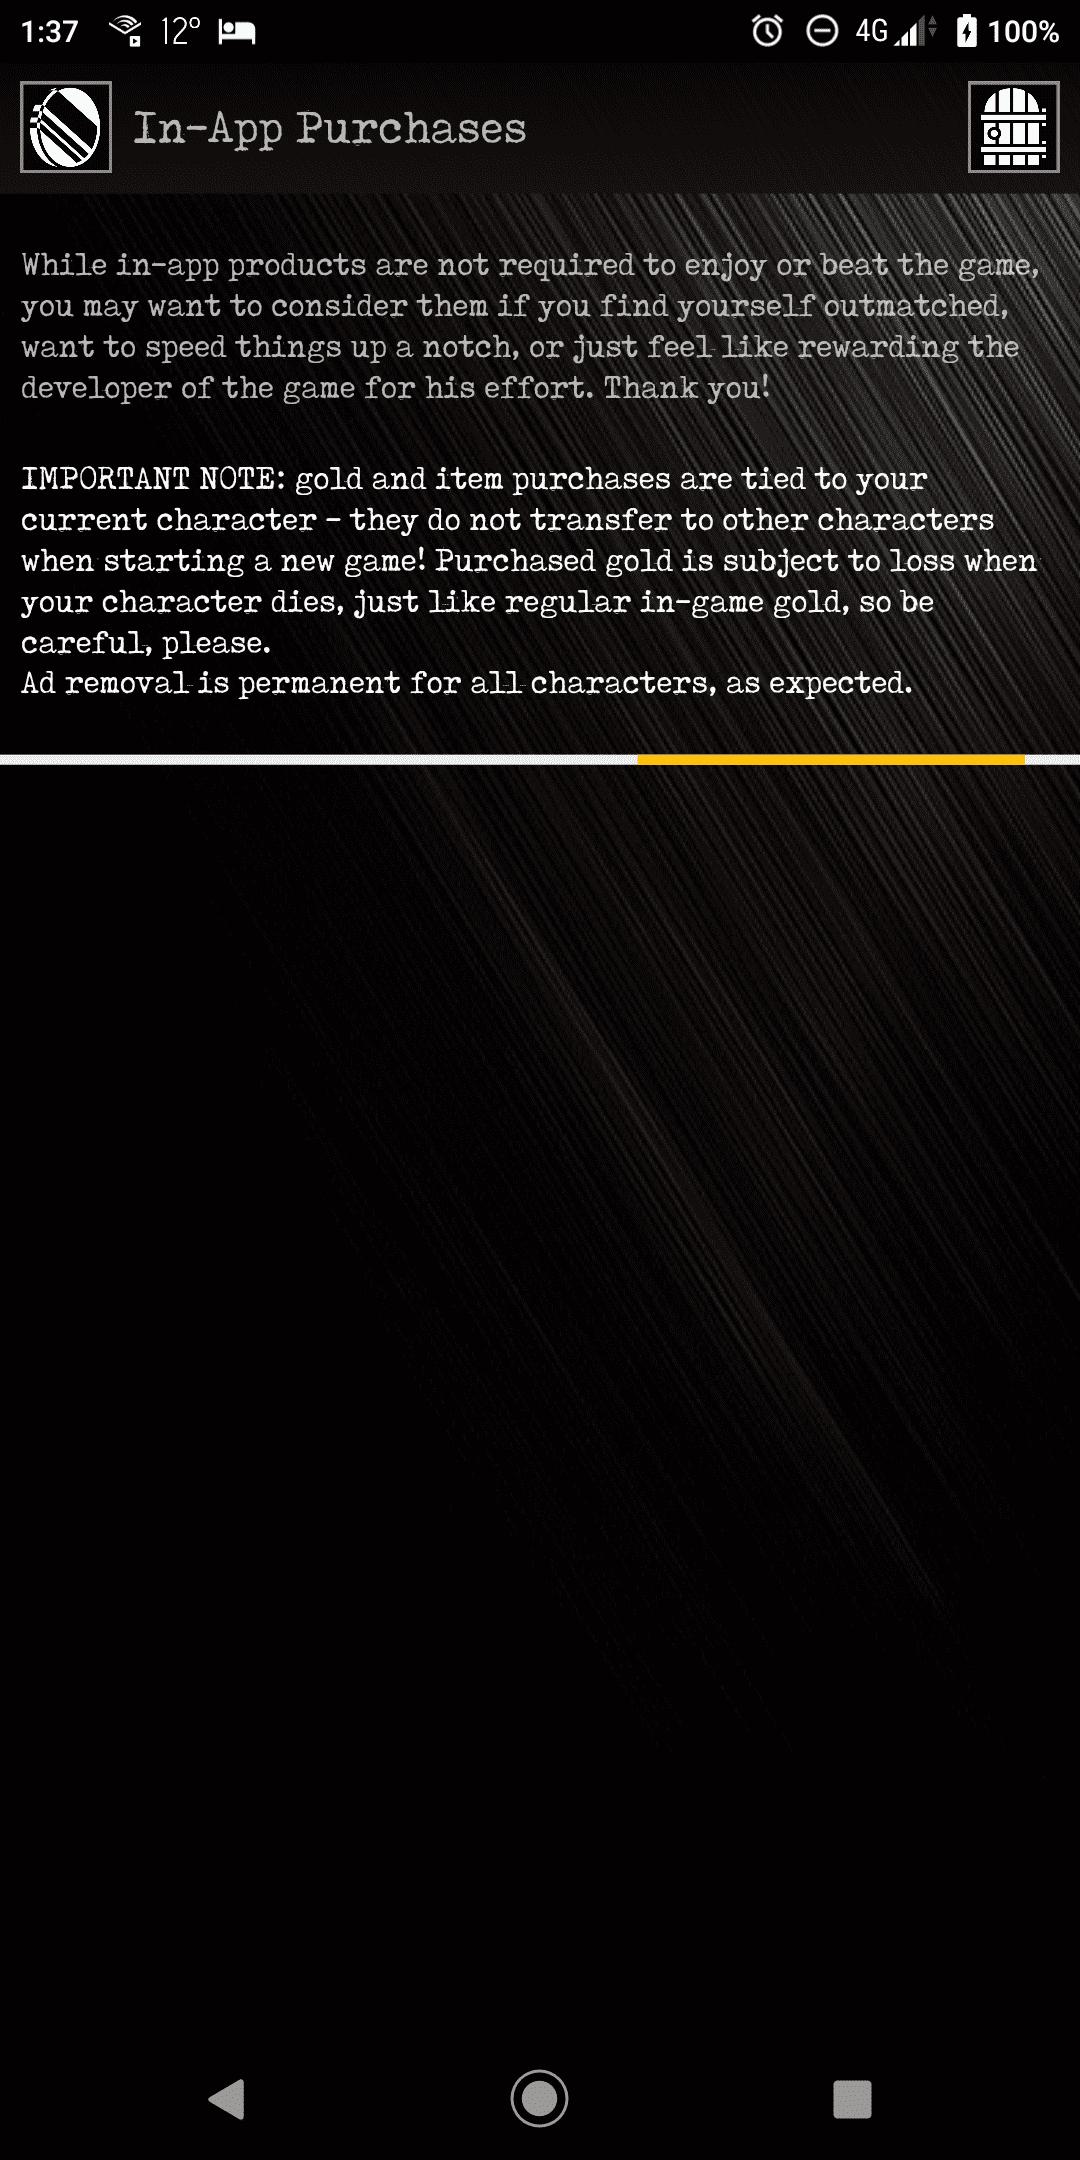 Screenshot_20201105-013704.png